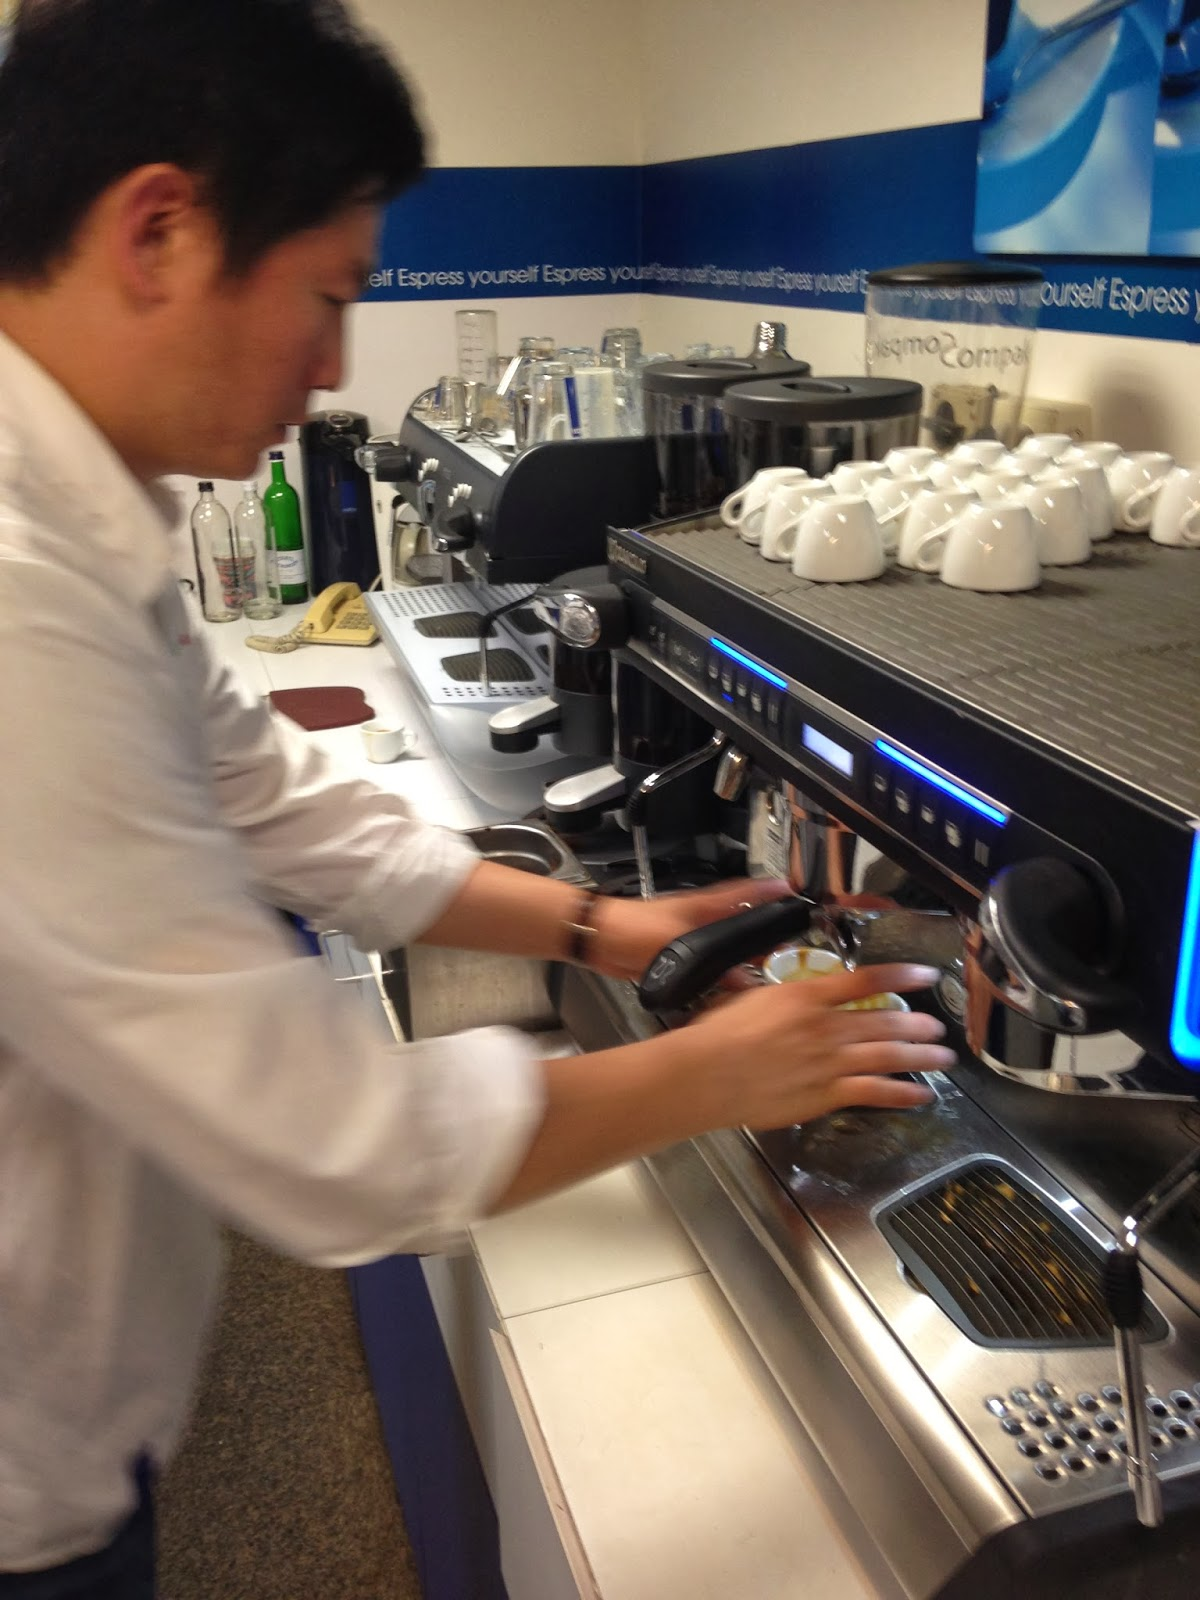 TBA 臺灣咖啡師協會: 國際咖啡品鑑大會 2013 ICT 亞洲 烘焙咖啡豆競賽-臺灣北中南座談會